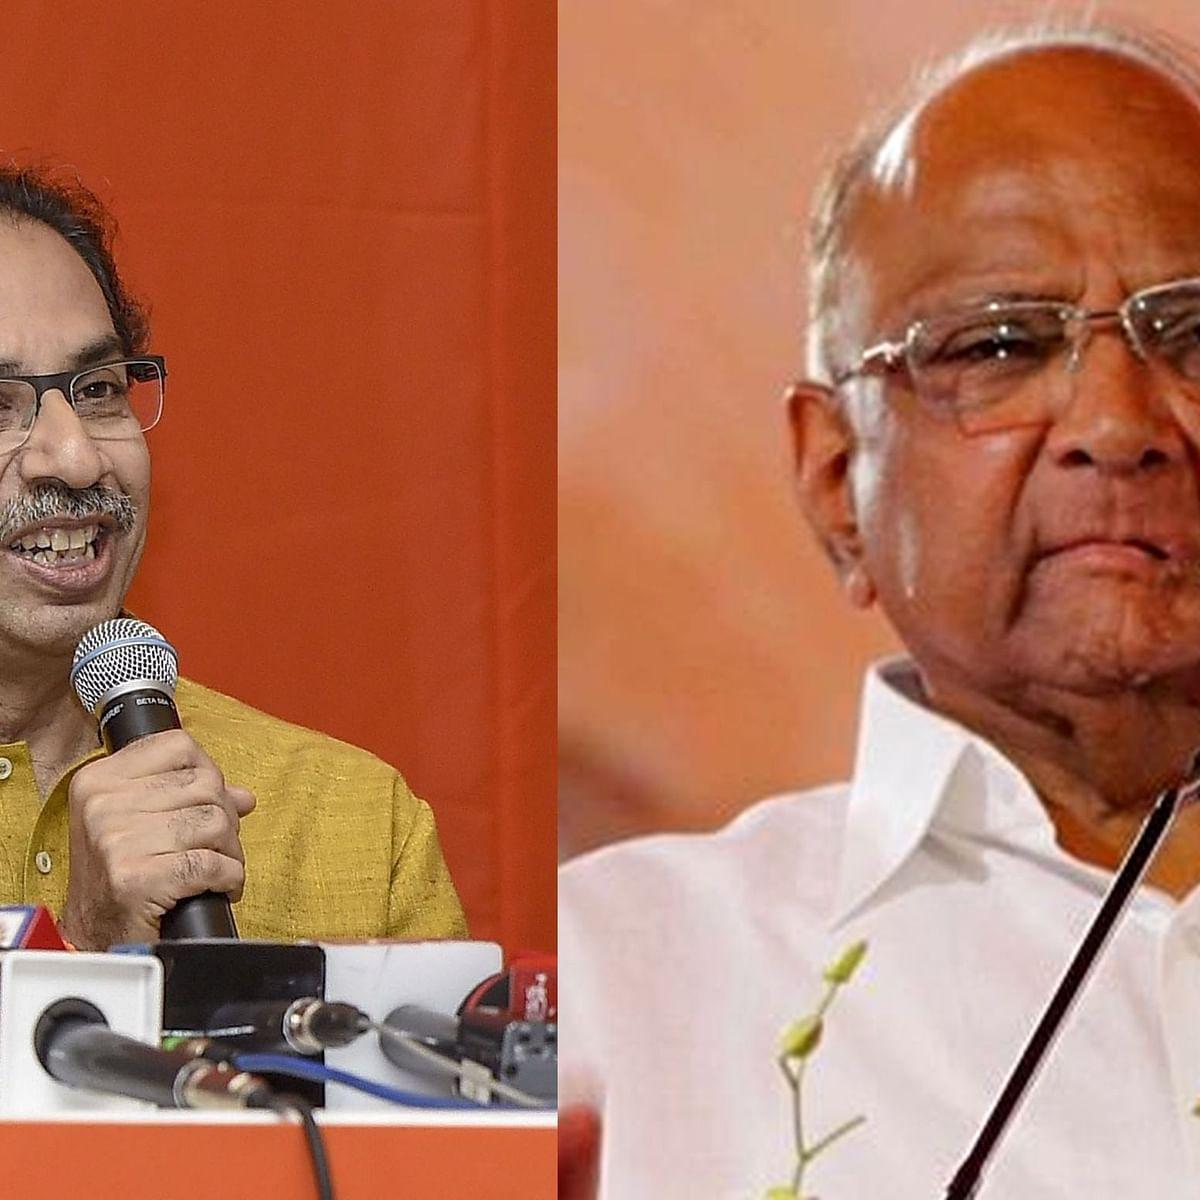 Maha Impasse: How BJP's stupendous success has sown seeds of discontent